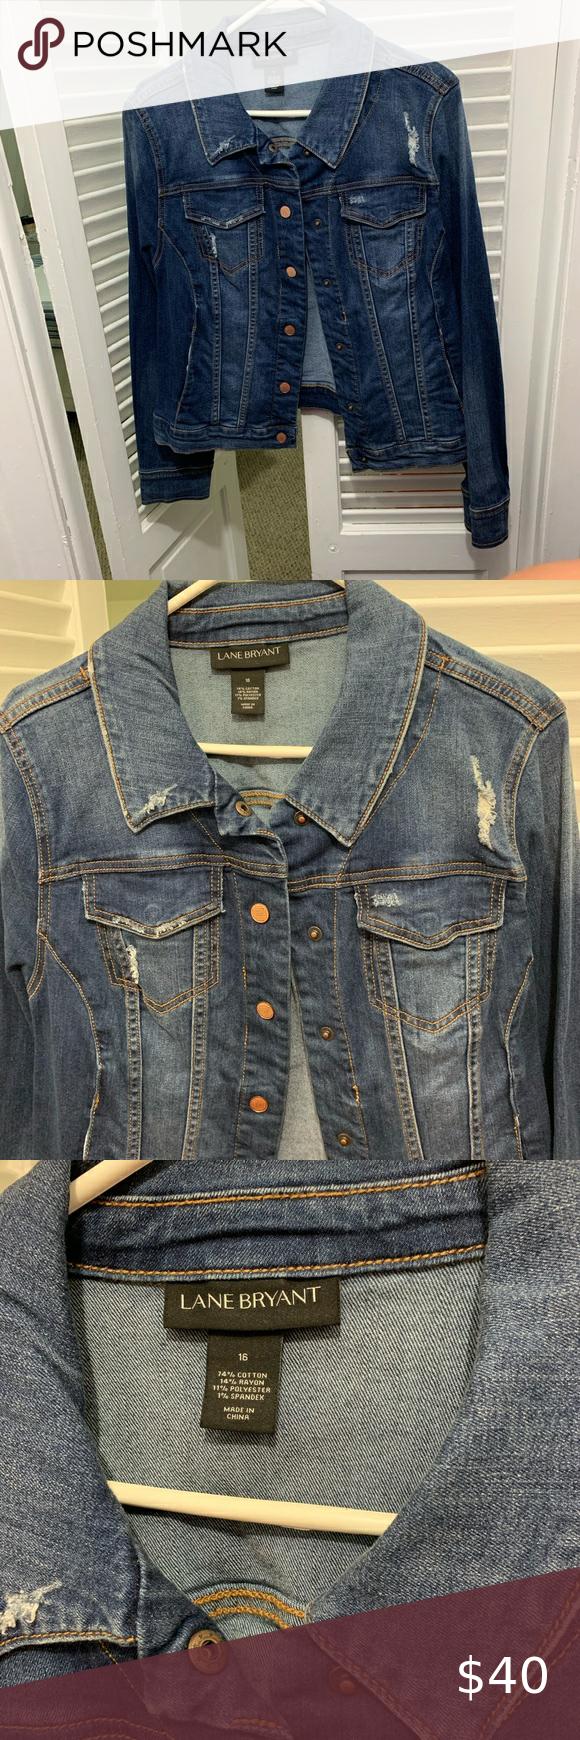 Lane Bryant Destructed Denim Jacket Size 16 Destructed Denim Jacket Denim Jacket Destructed Denim [ 1740 x 580 Pixel ]